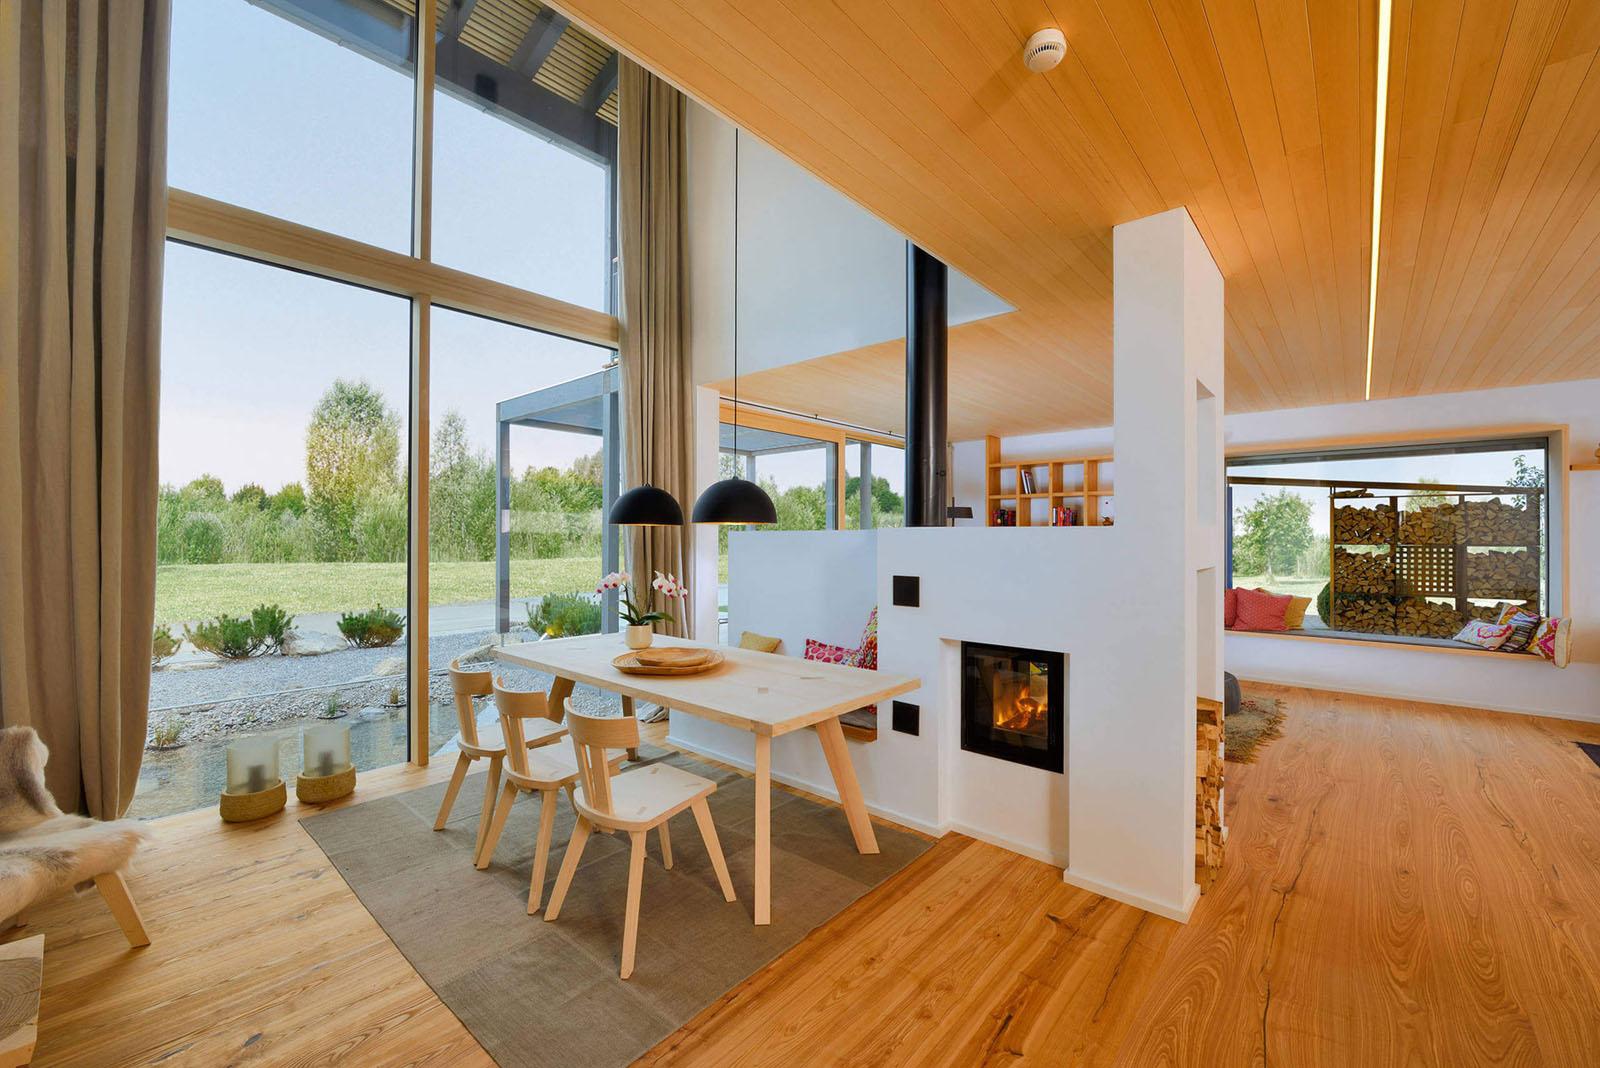 Bauhaus Inspired Energy Saving House With Modern Alpine